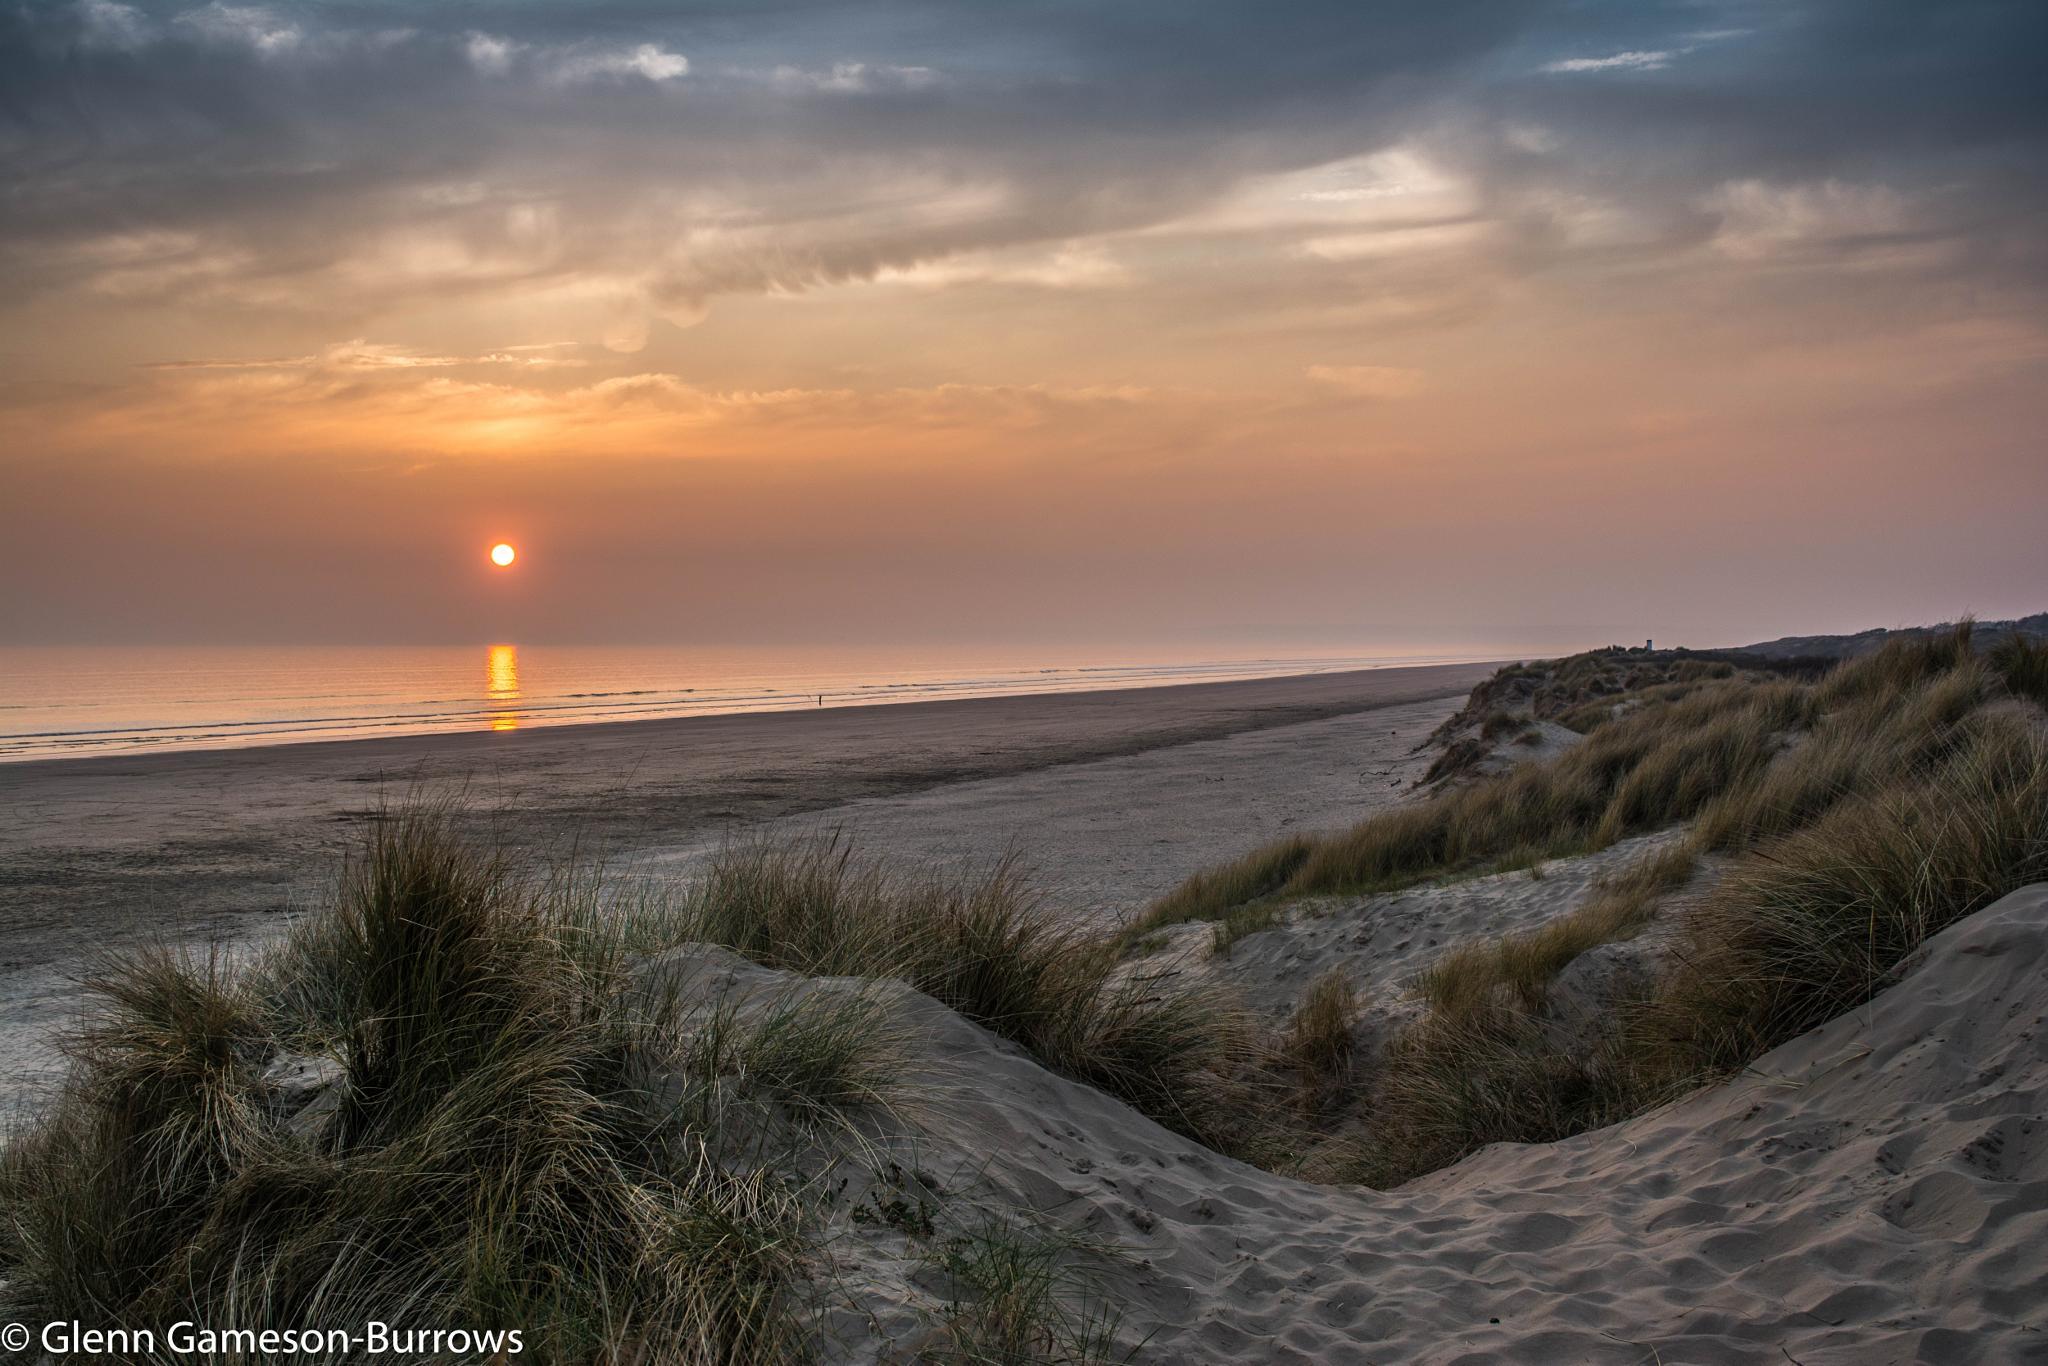 Cefn Sidan Sunset by glenn.gamesonburrows